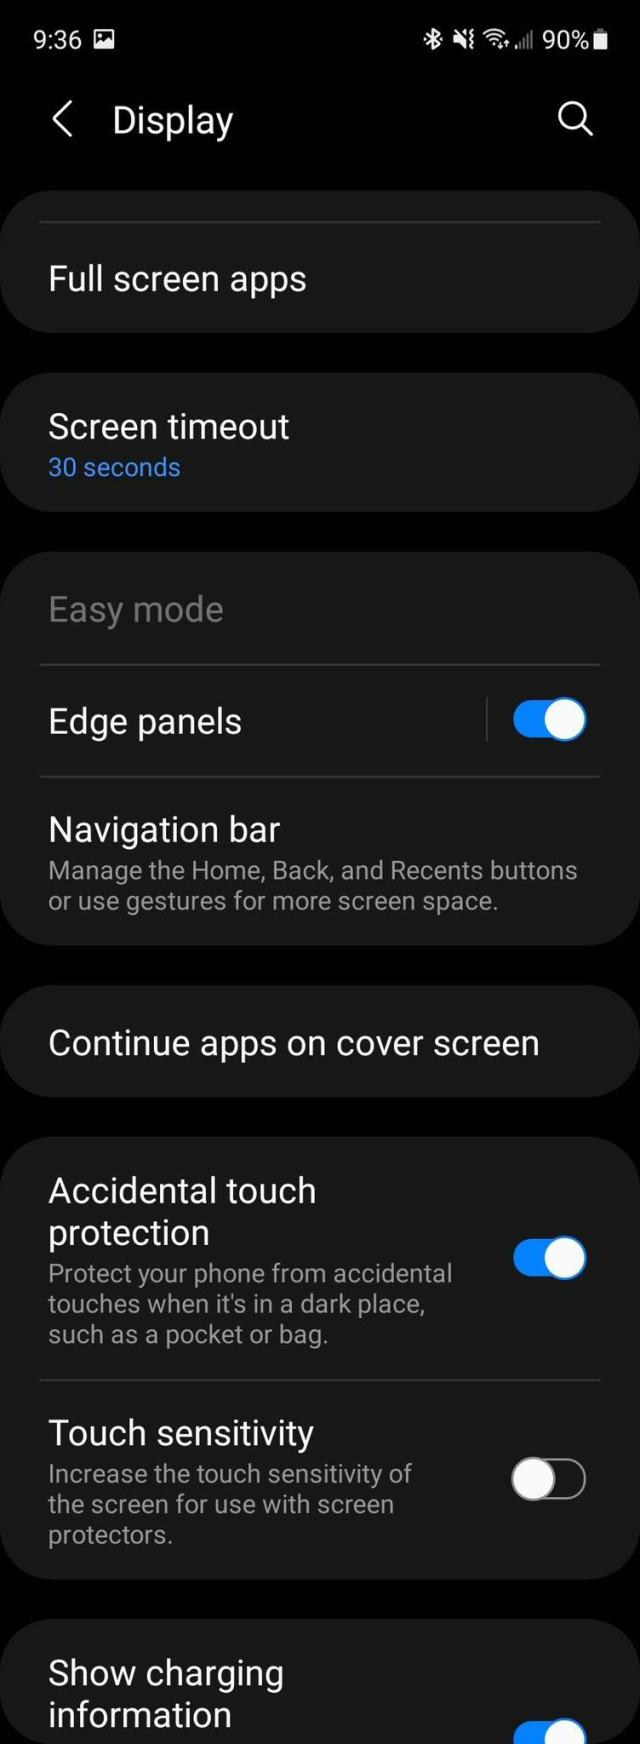 Samsung Galaxy Z Fold 3 Settings Screenshot